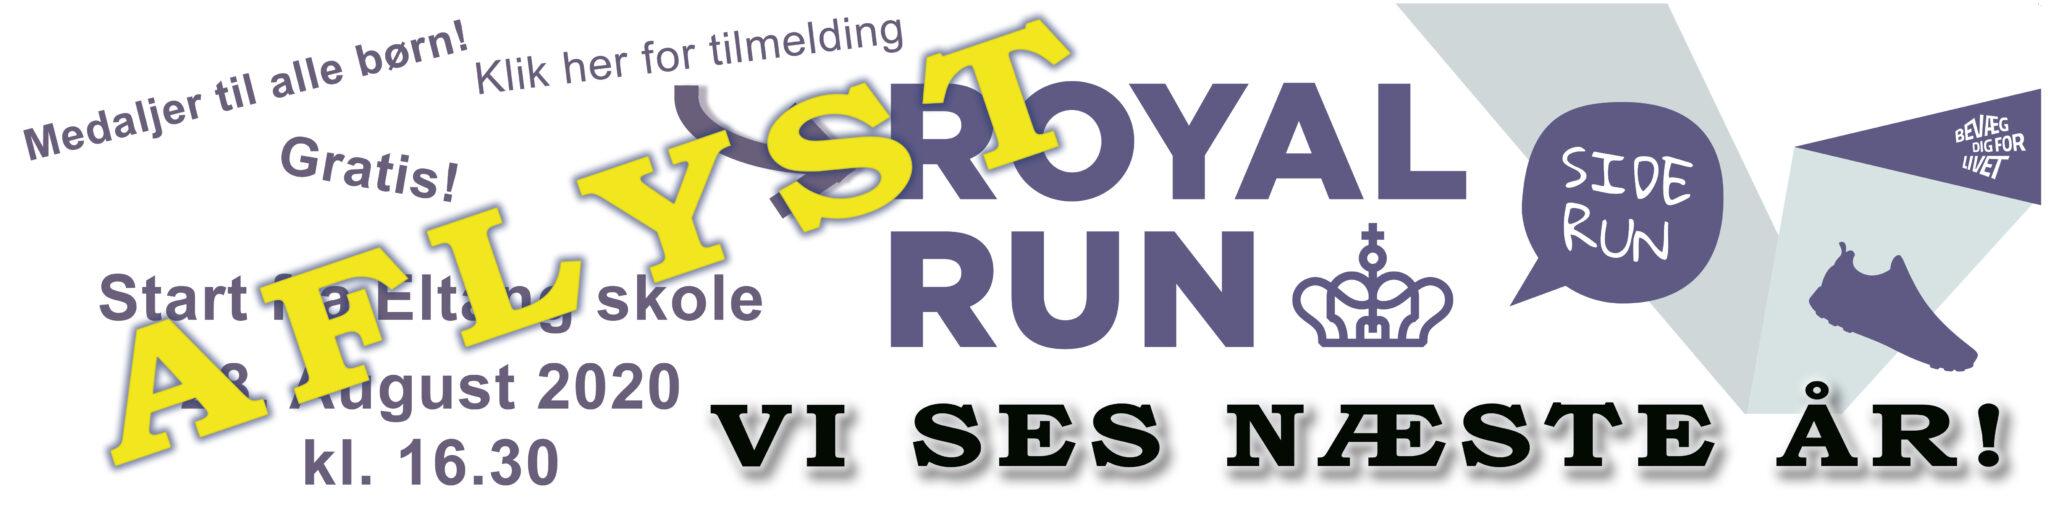 Royal run banner 2020 august aflyst